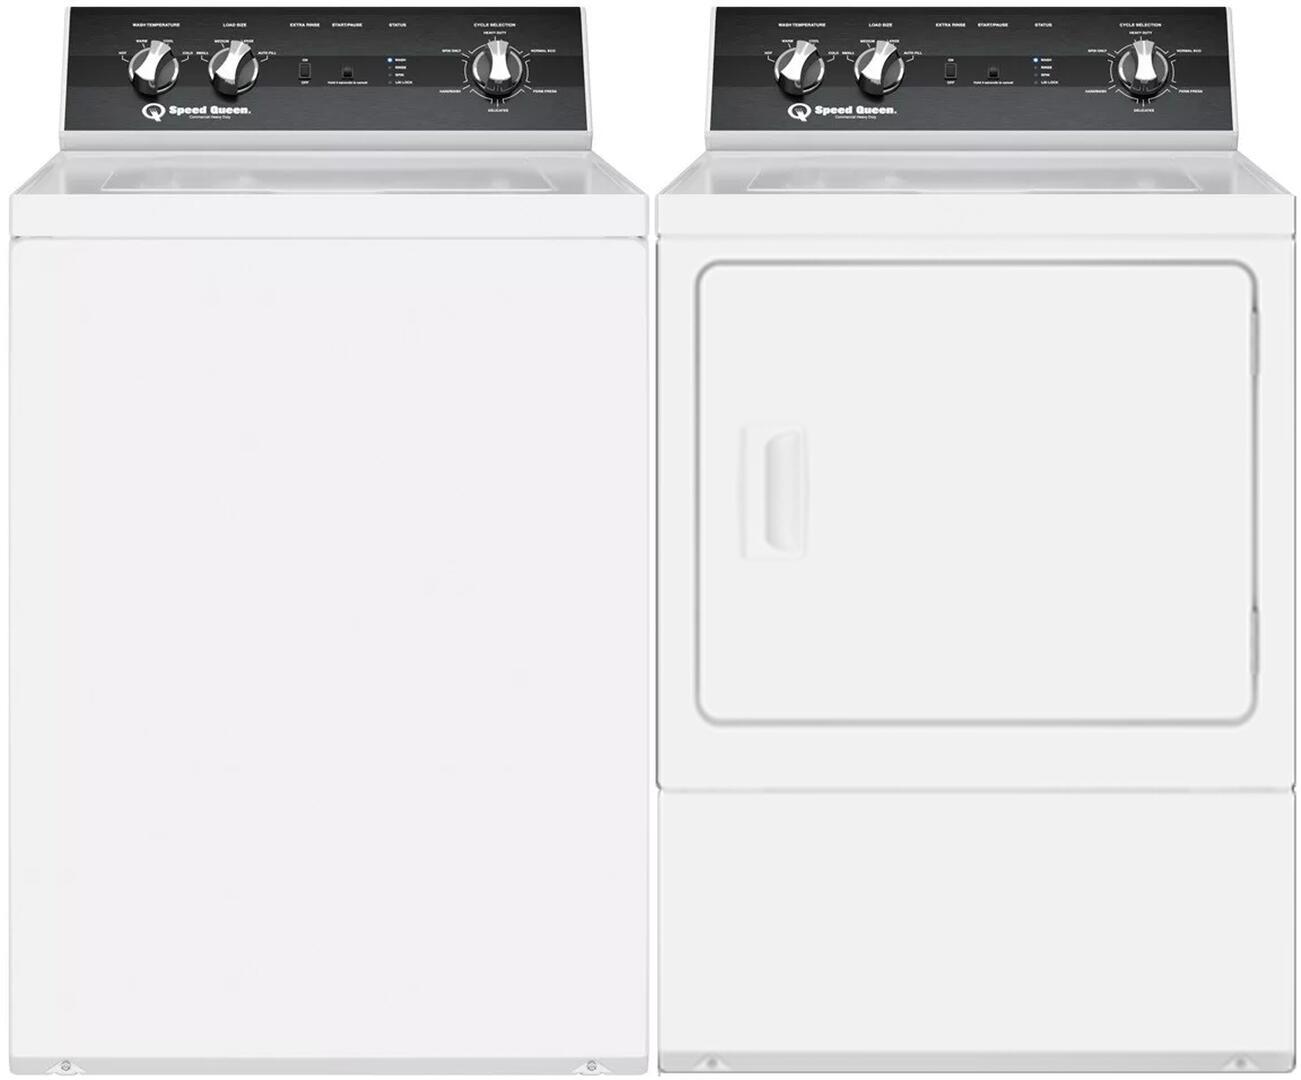 Speed Queen Residential Washer Dryer Pair